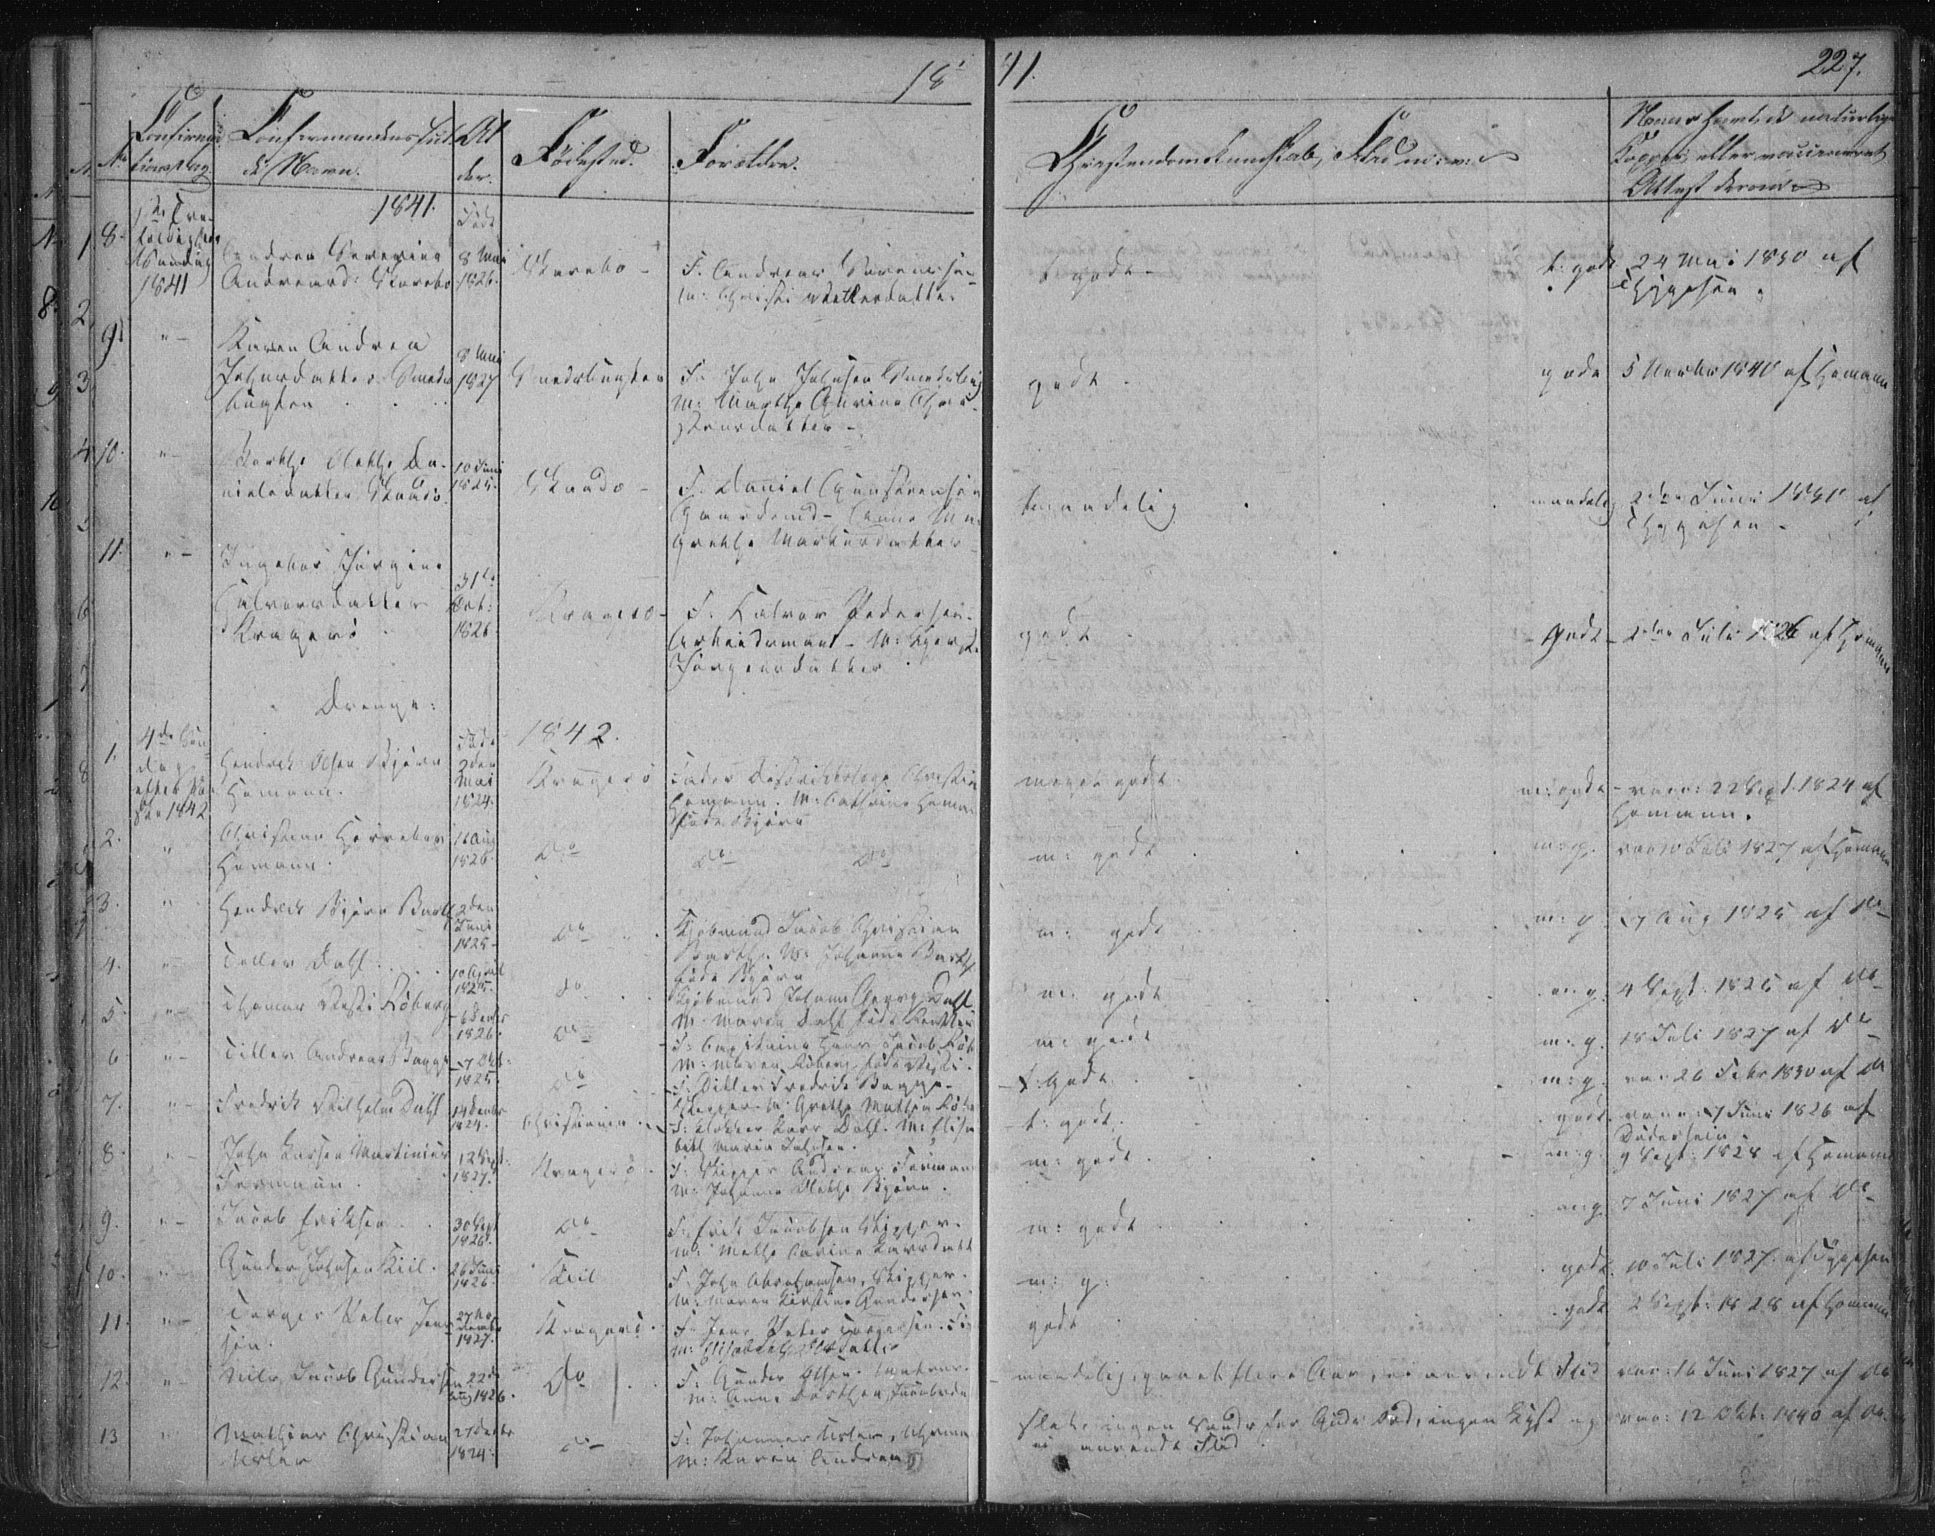 SAKO, Kragerø kirkebøker, F/Fa/L0005: Ministerialbok nr. 5, 1832-1847, s. 227